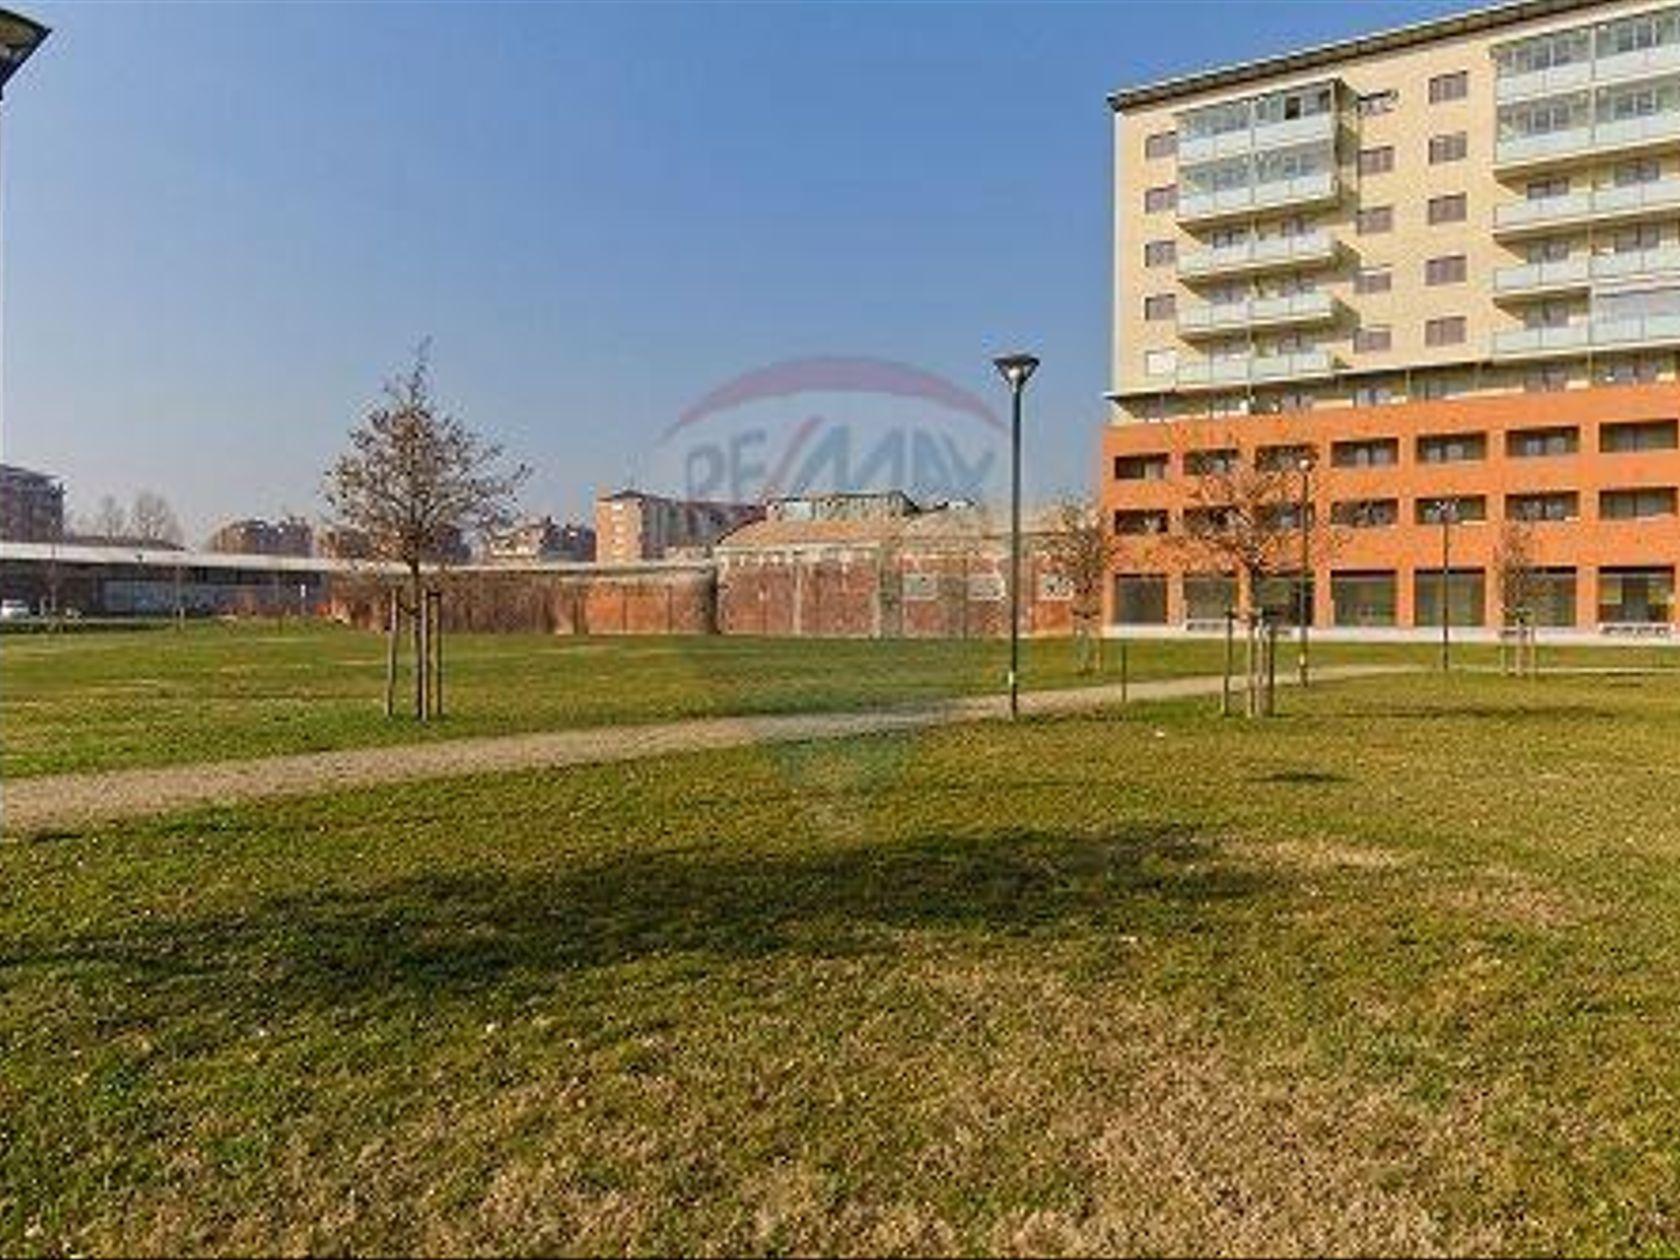 Appartamento Torino-madonna Di Campagna Borgo Vittoria Barrlanz, Torino, TO Vendita